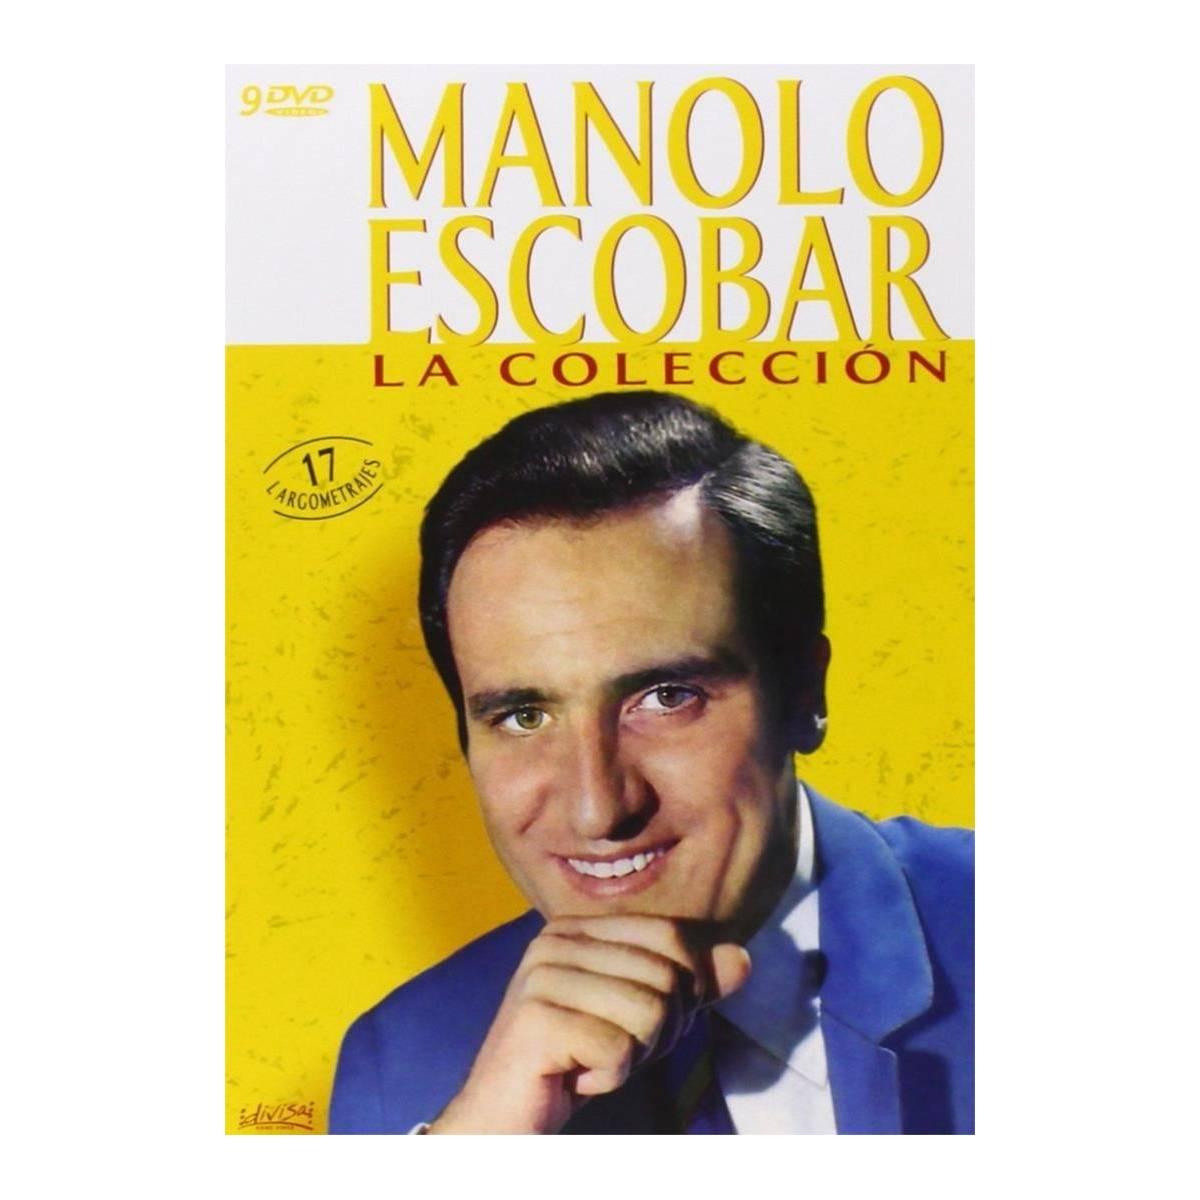 Caminreal Manolo Escobar